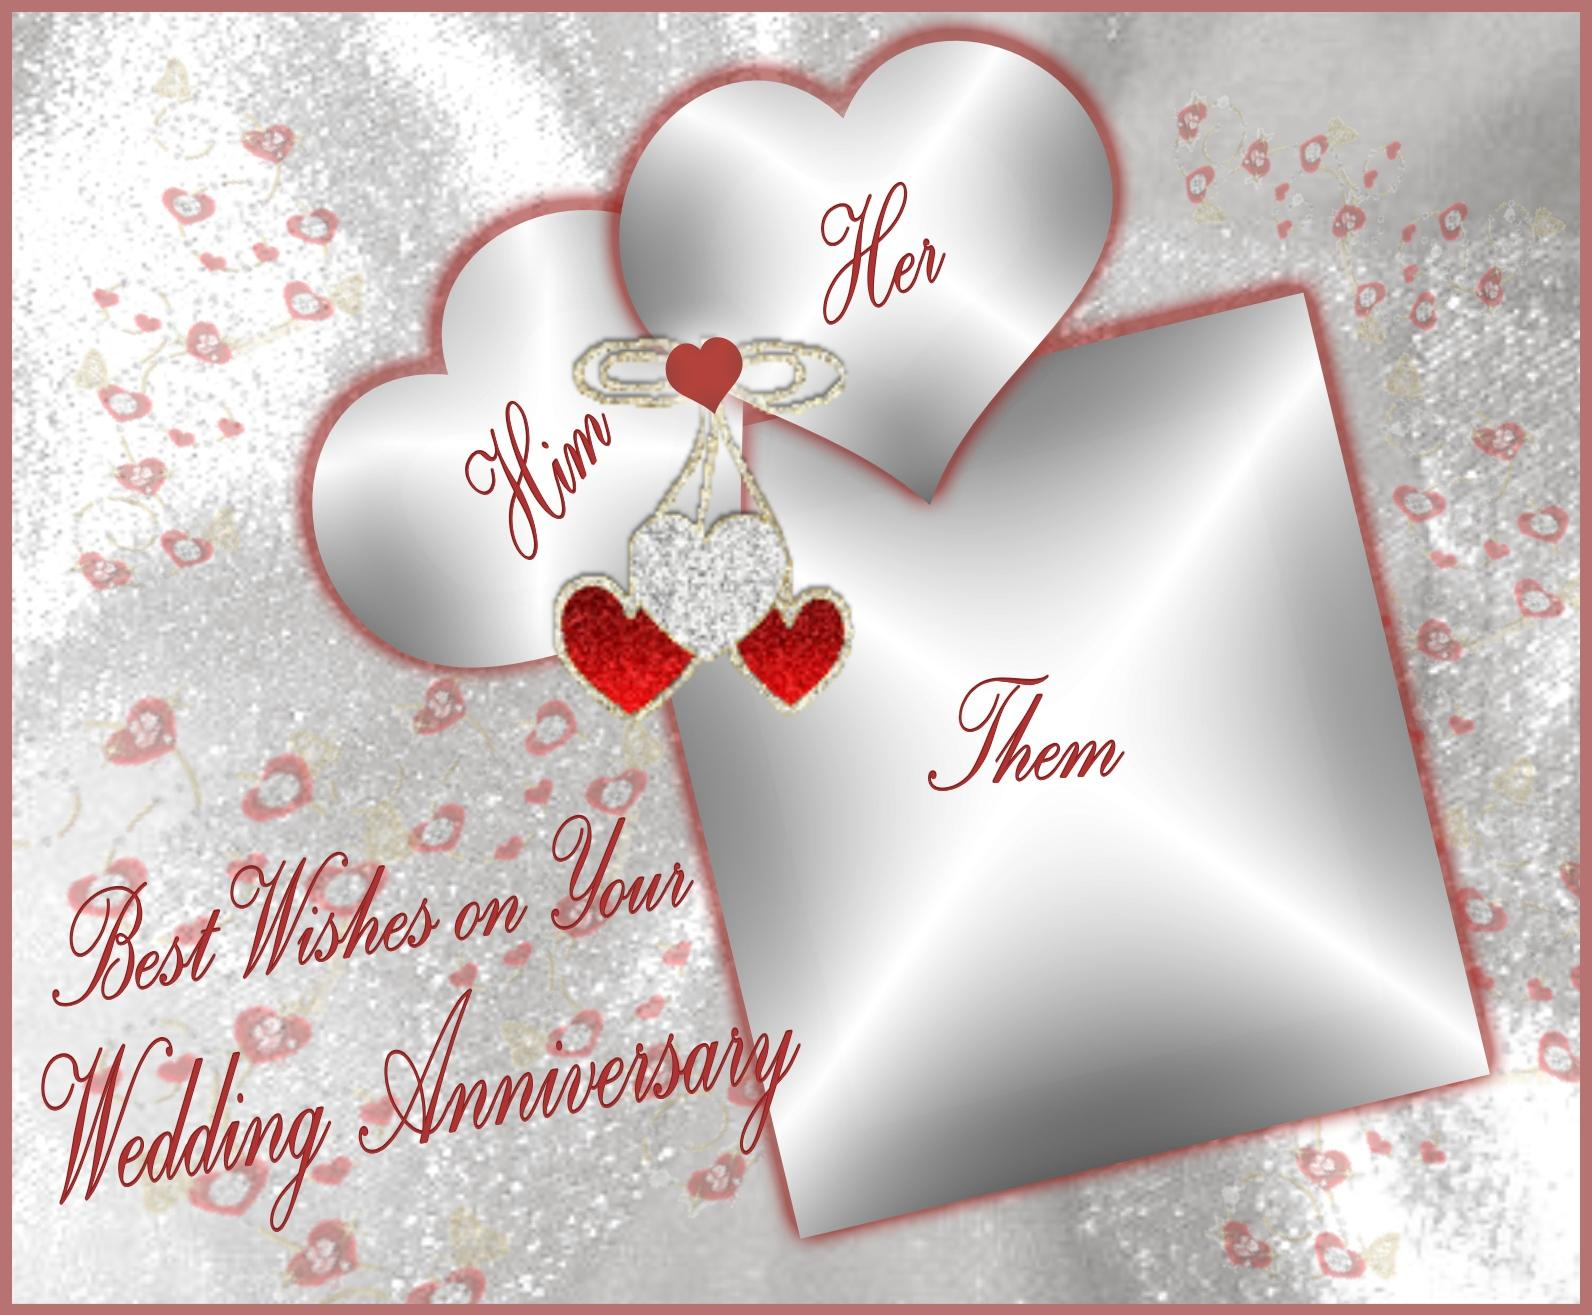 Imikimi Zo Anniversarie Frames   Anniversary Wishes Best Wishes On Your Wedding Anniversary Tjkstevens